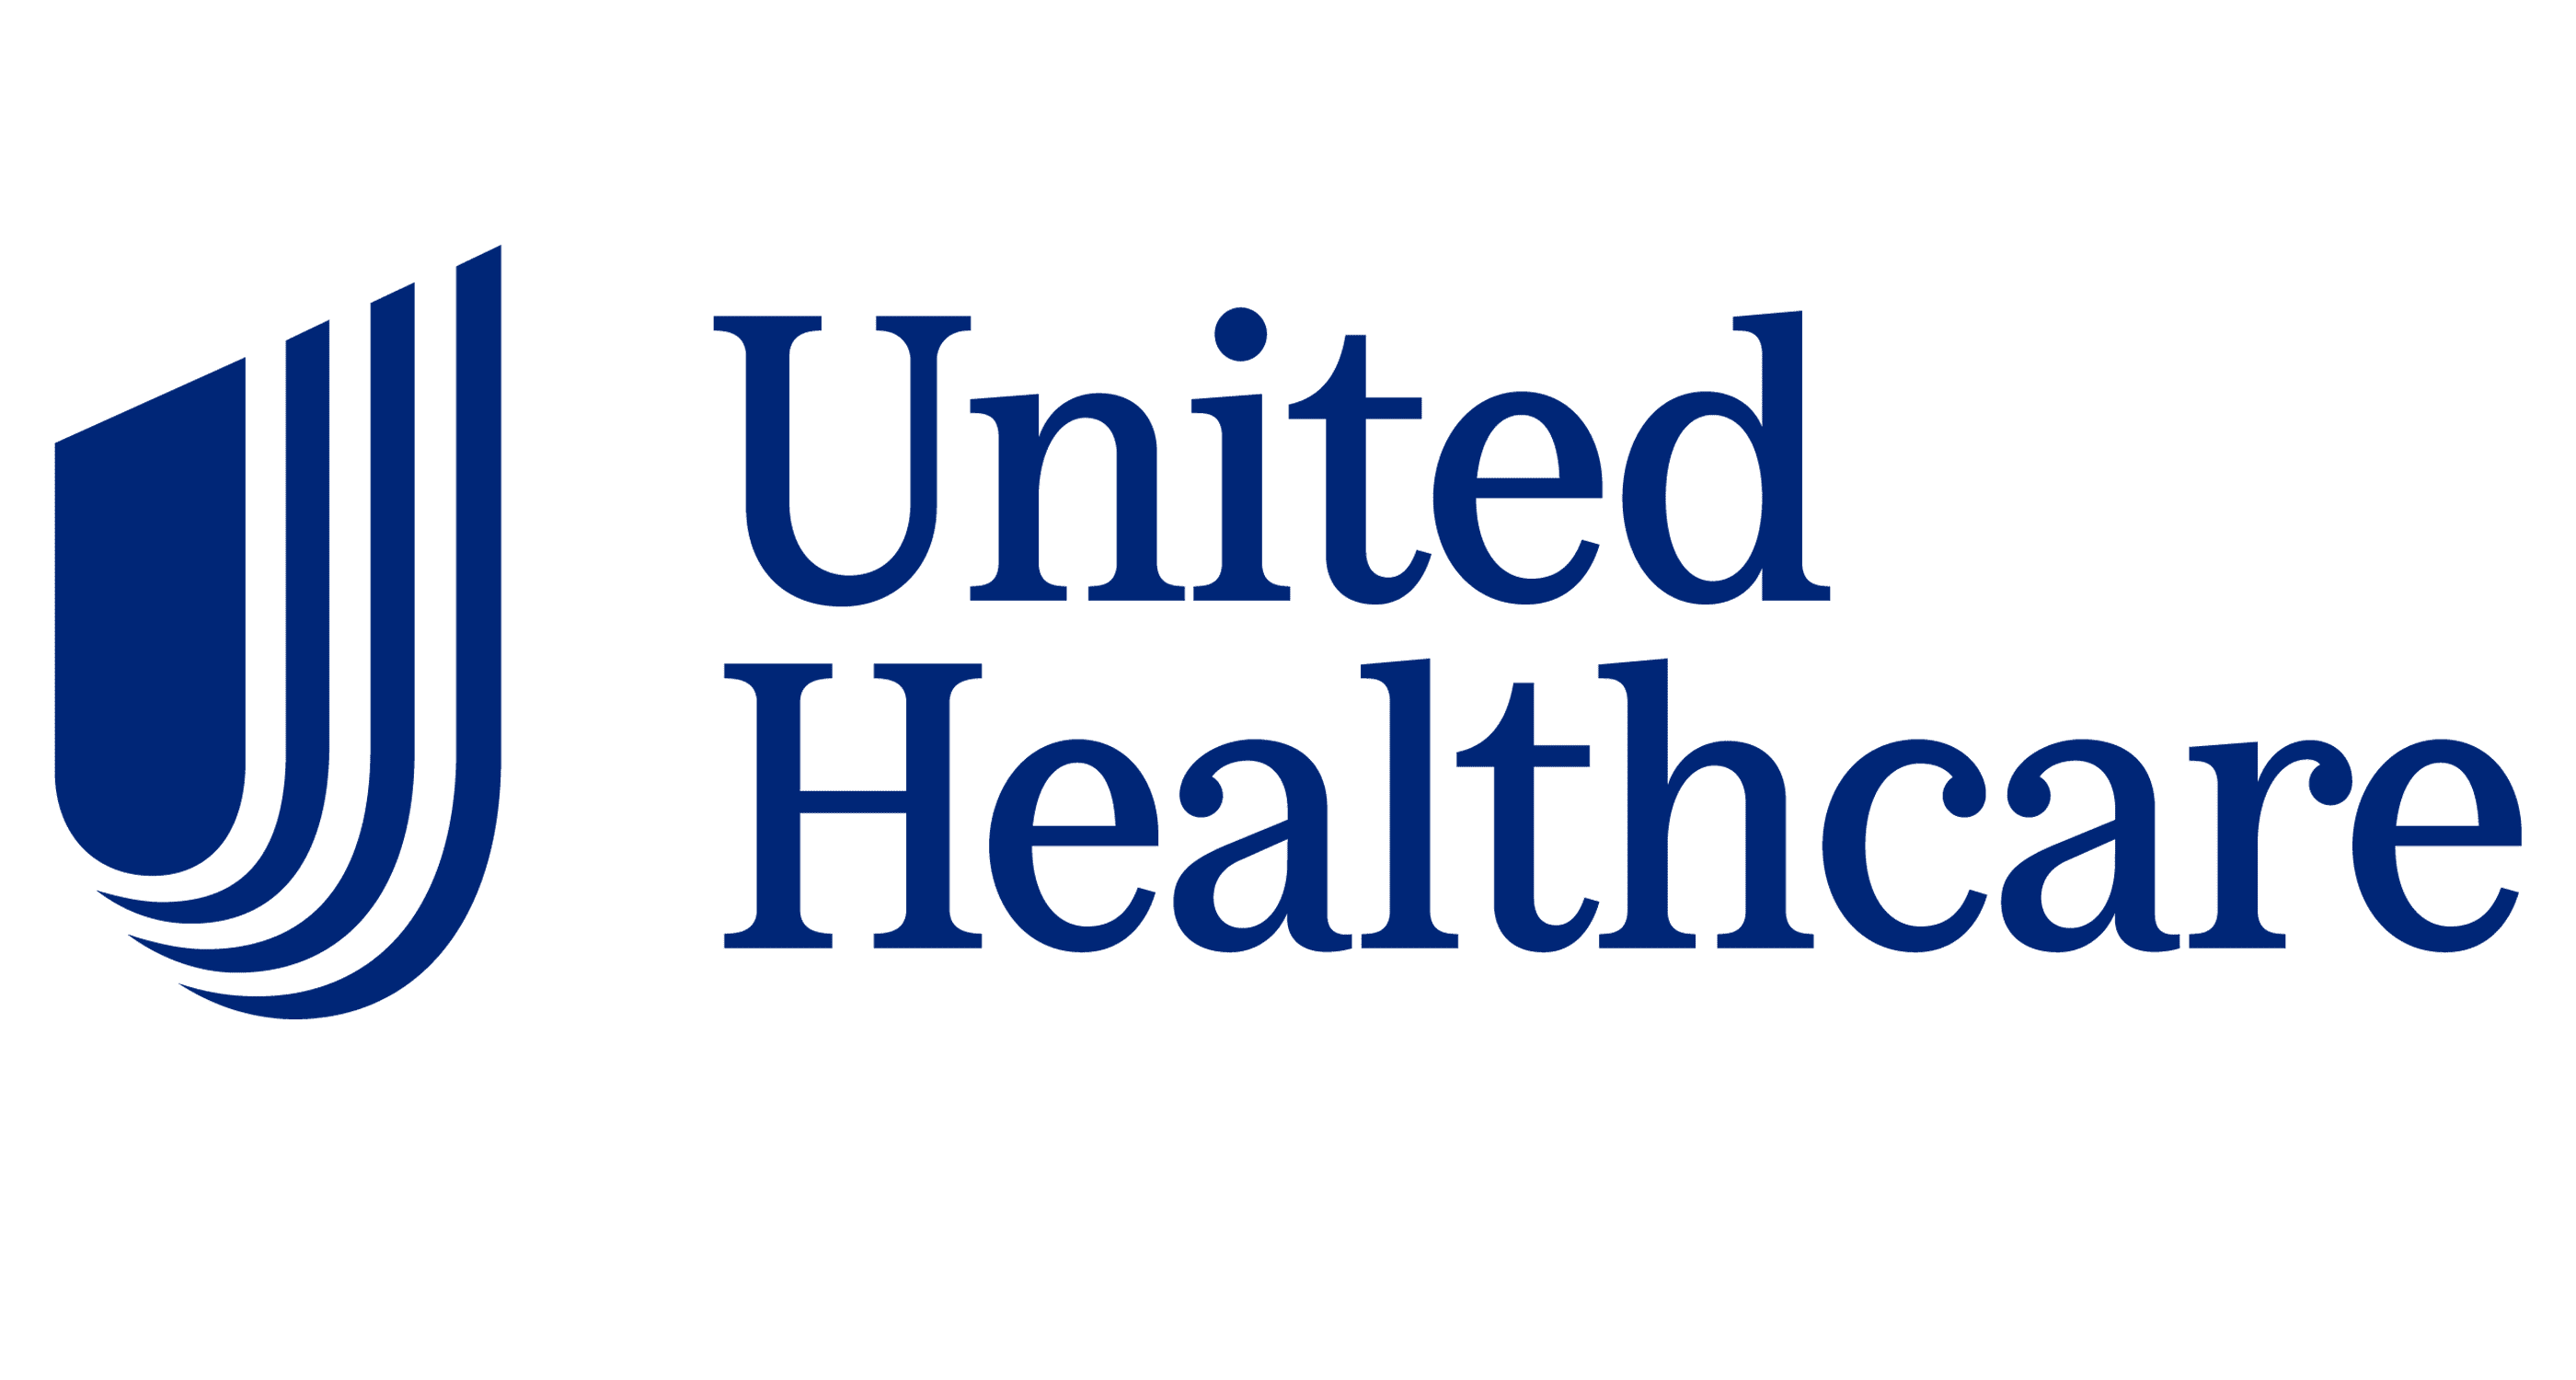 UnitedHealth Group's logo